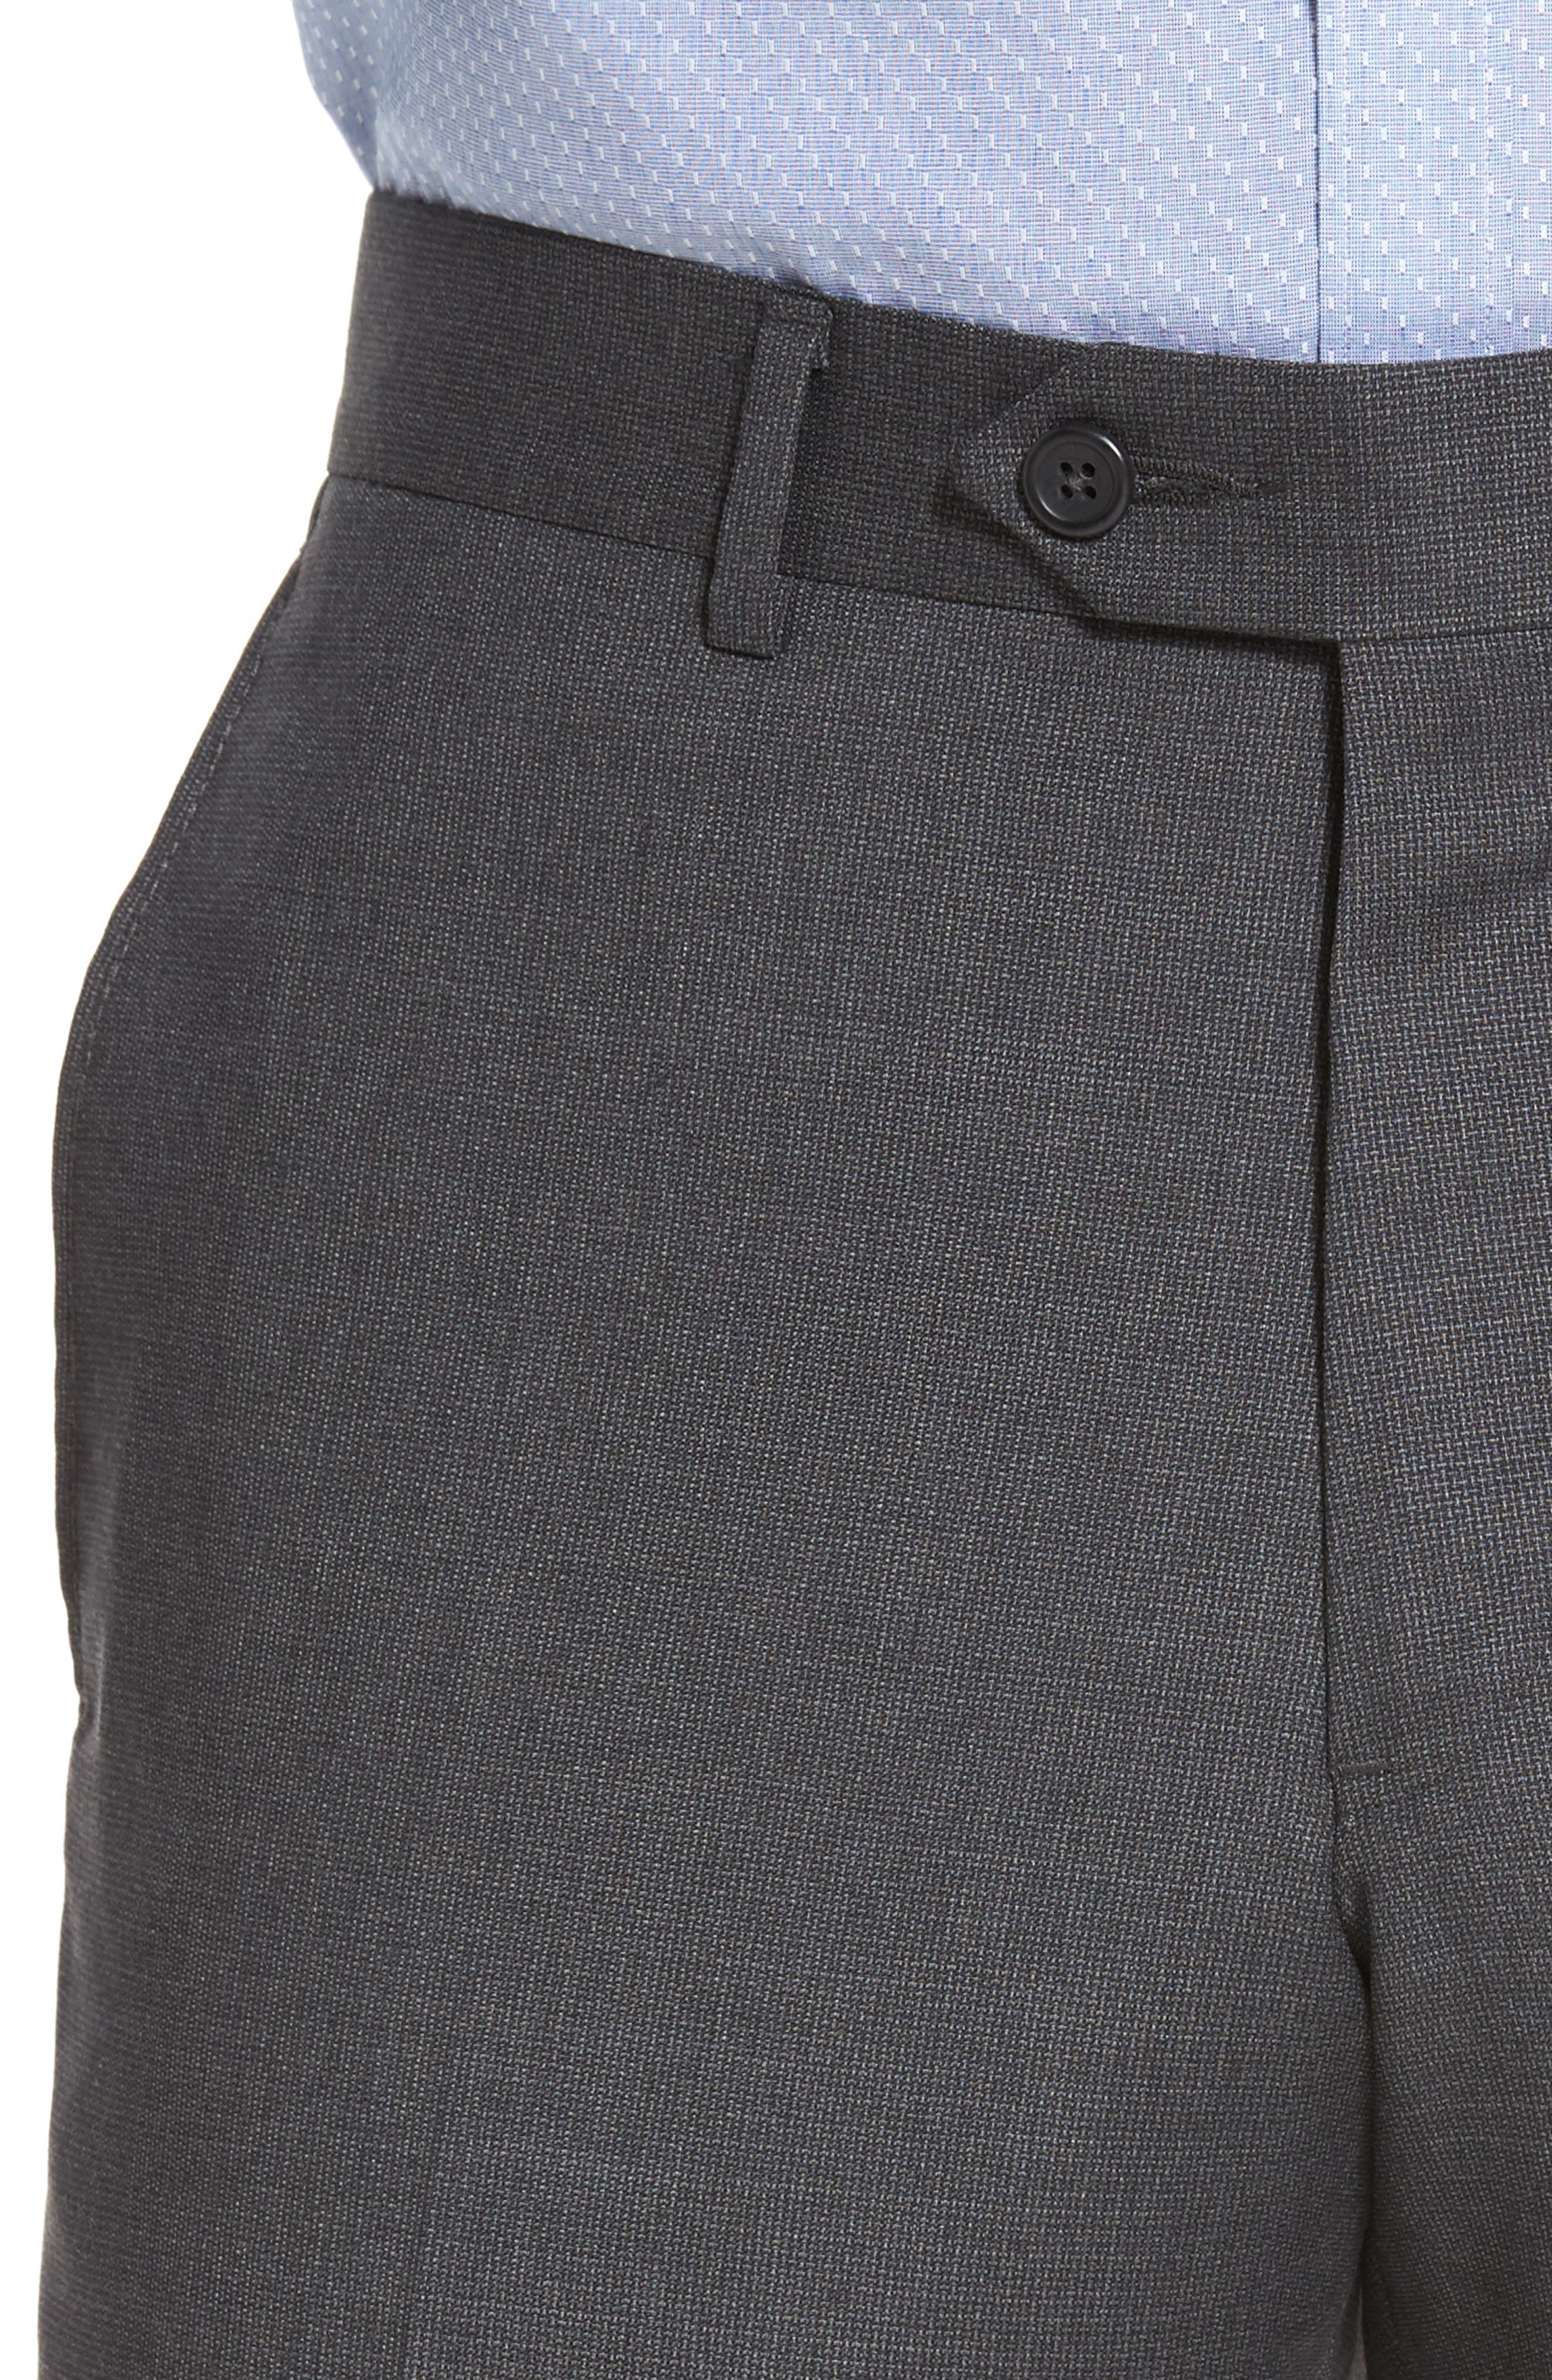 Alternate Image 4  - Nordstrom Men's Shop Flat Front Solid Wool Suit Trousers